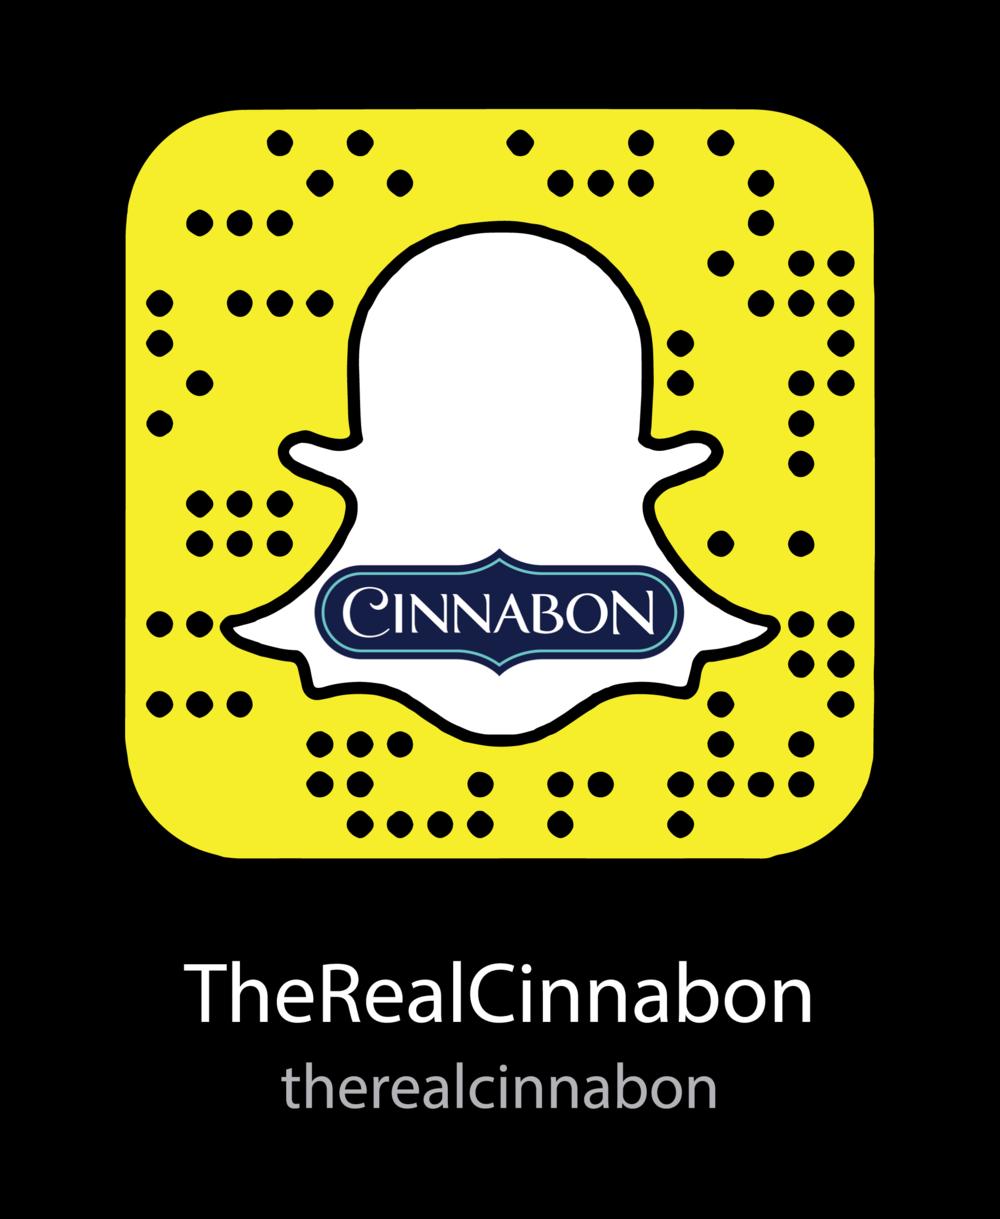 therealcinnabon-Brands-snapchat-snapcode.png